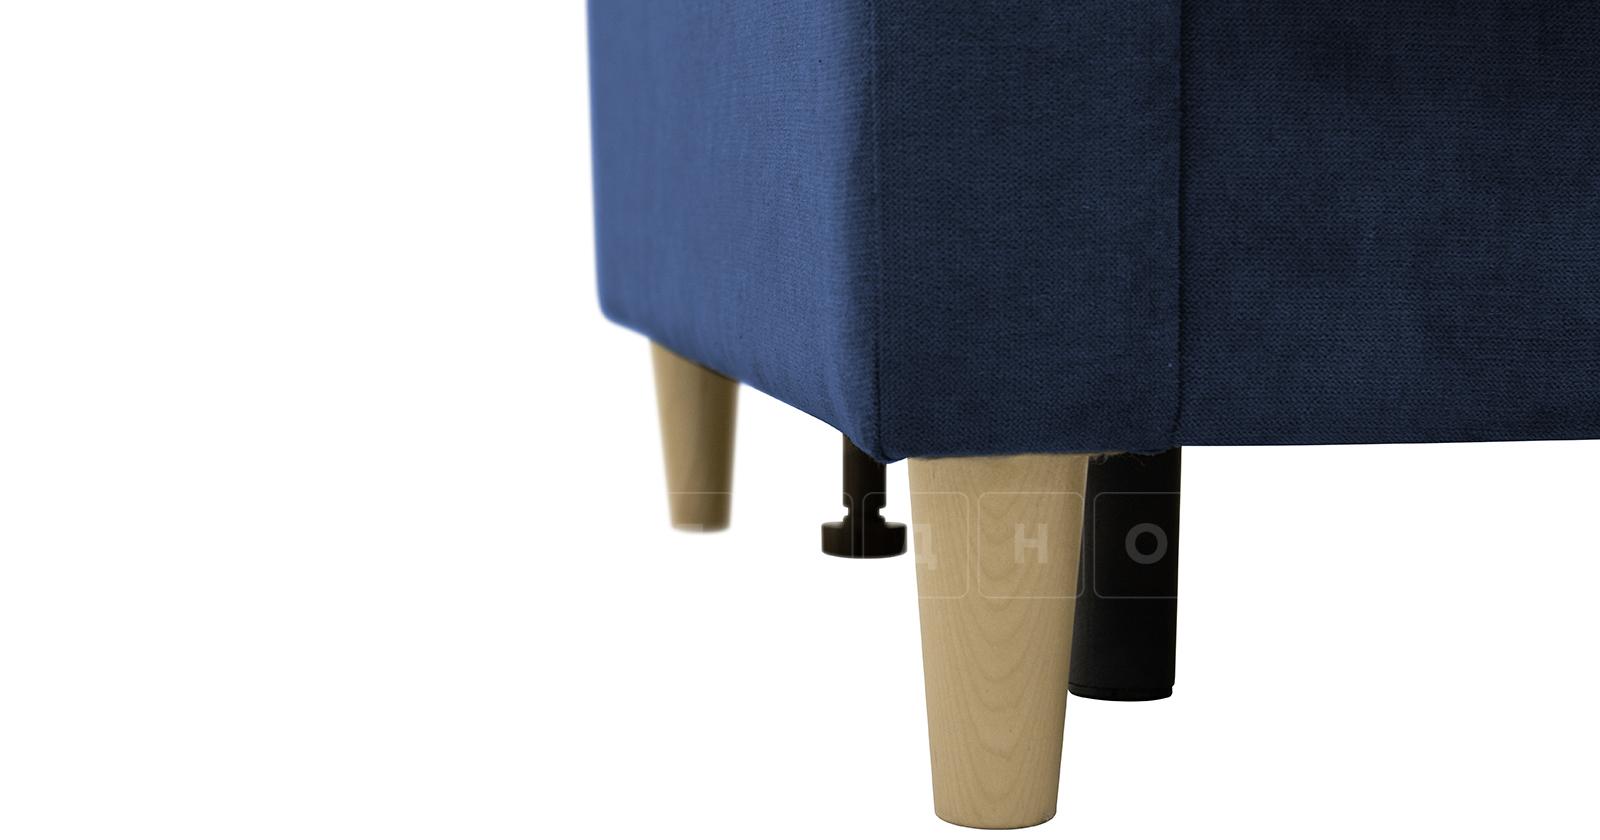 Диван еврокнижка Дарвин темно-синий фото 9   интернет-магазин Складно